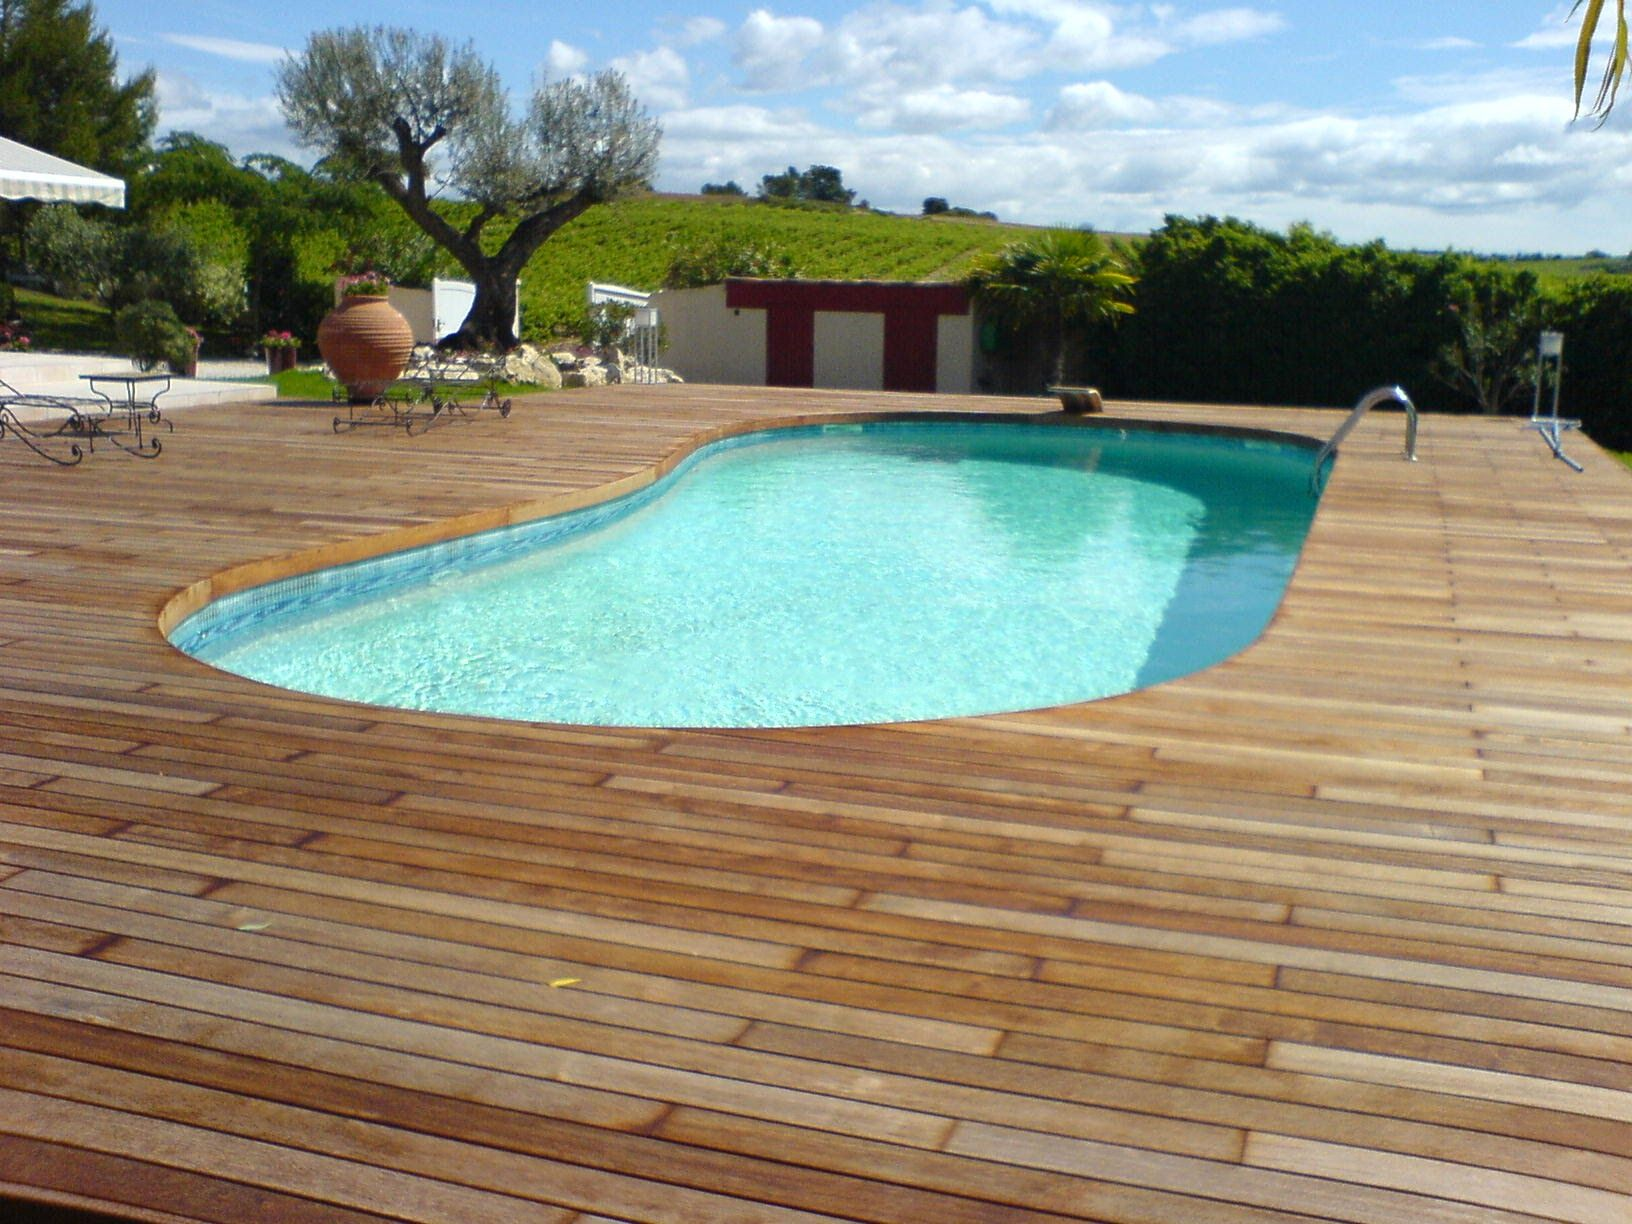 Terrasse De Piscine En Merbau Visserie Cach E Avec Margelle  ~ Terrasse Bois Piscine Octogonale